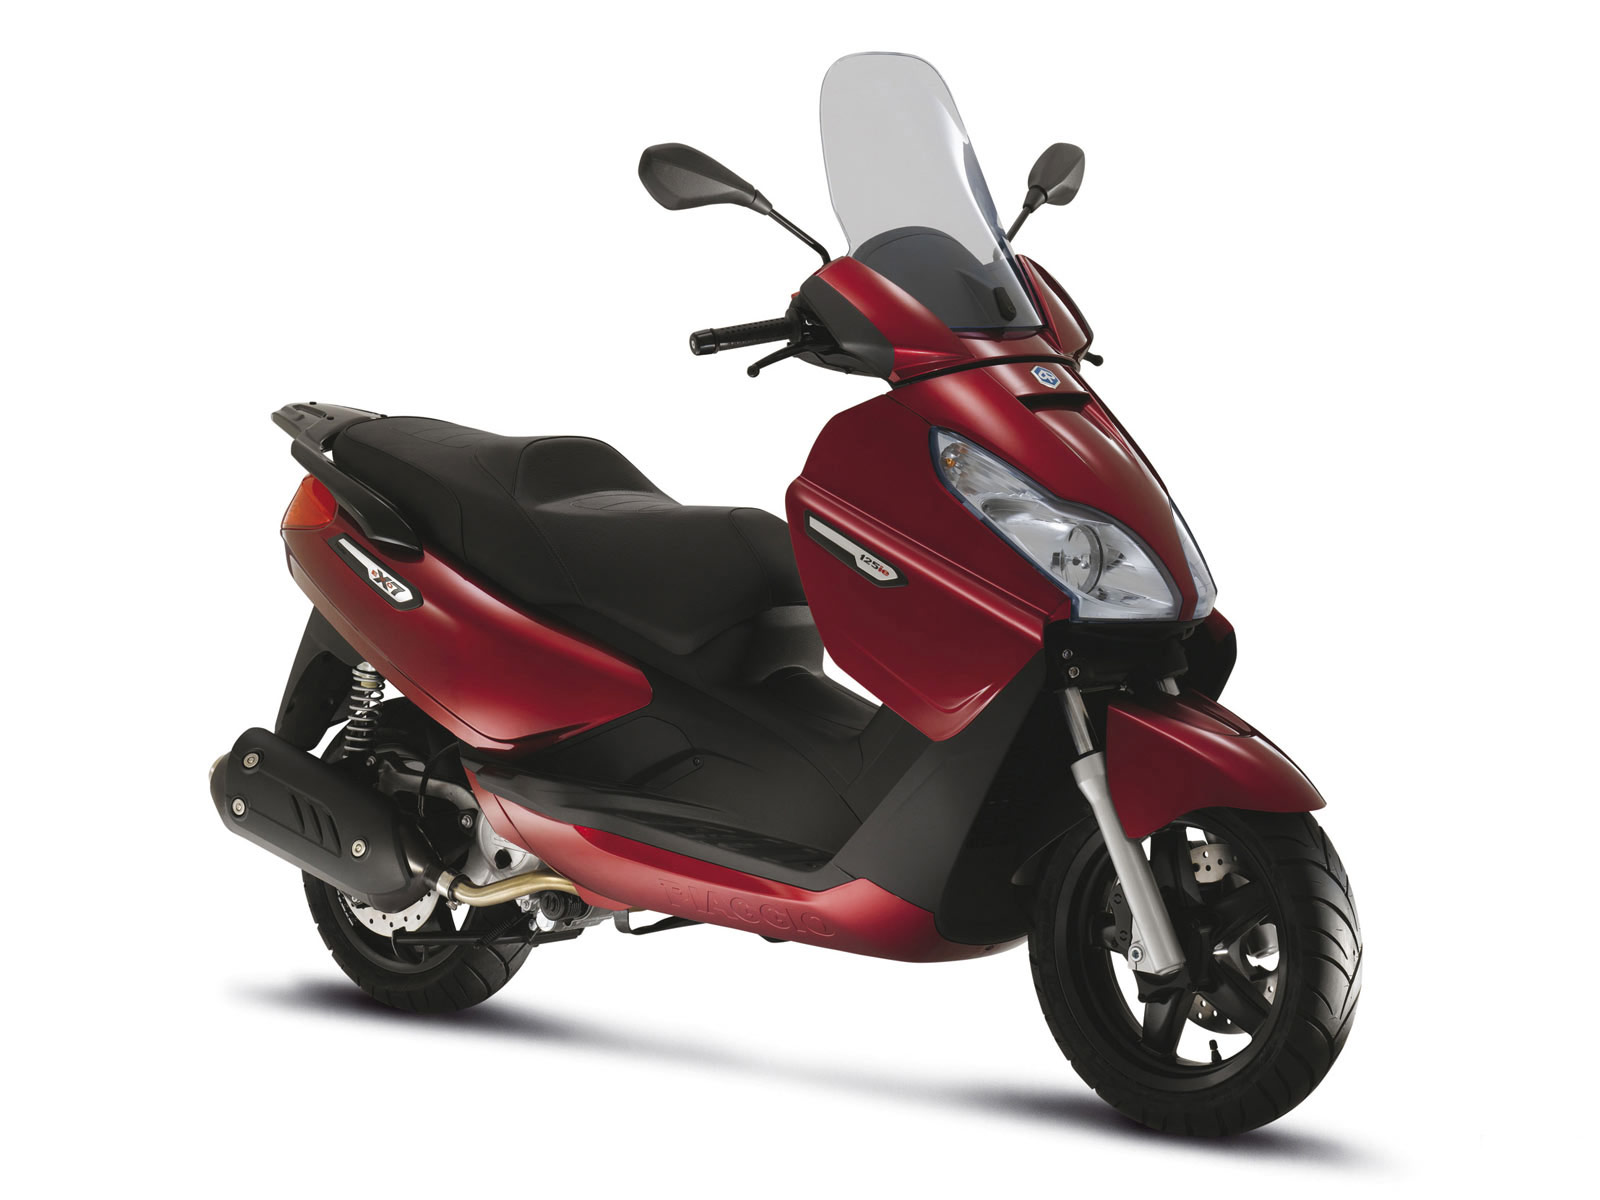 PIAGGIO X7 125IE (2010) Scooter Insurance